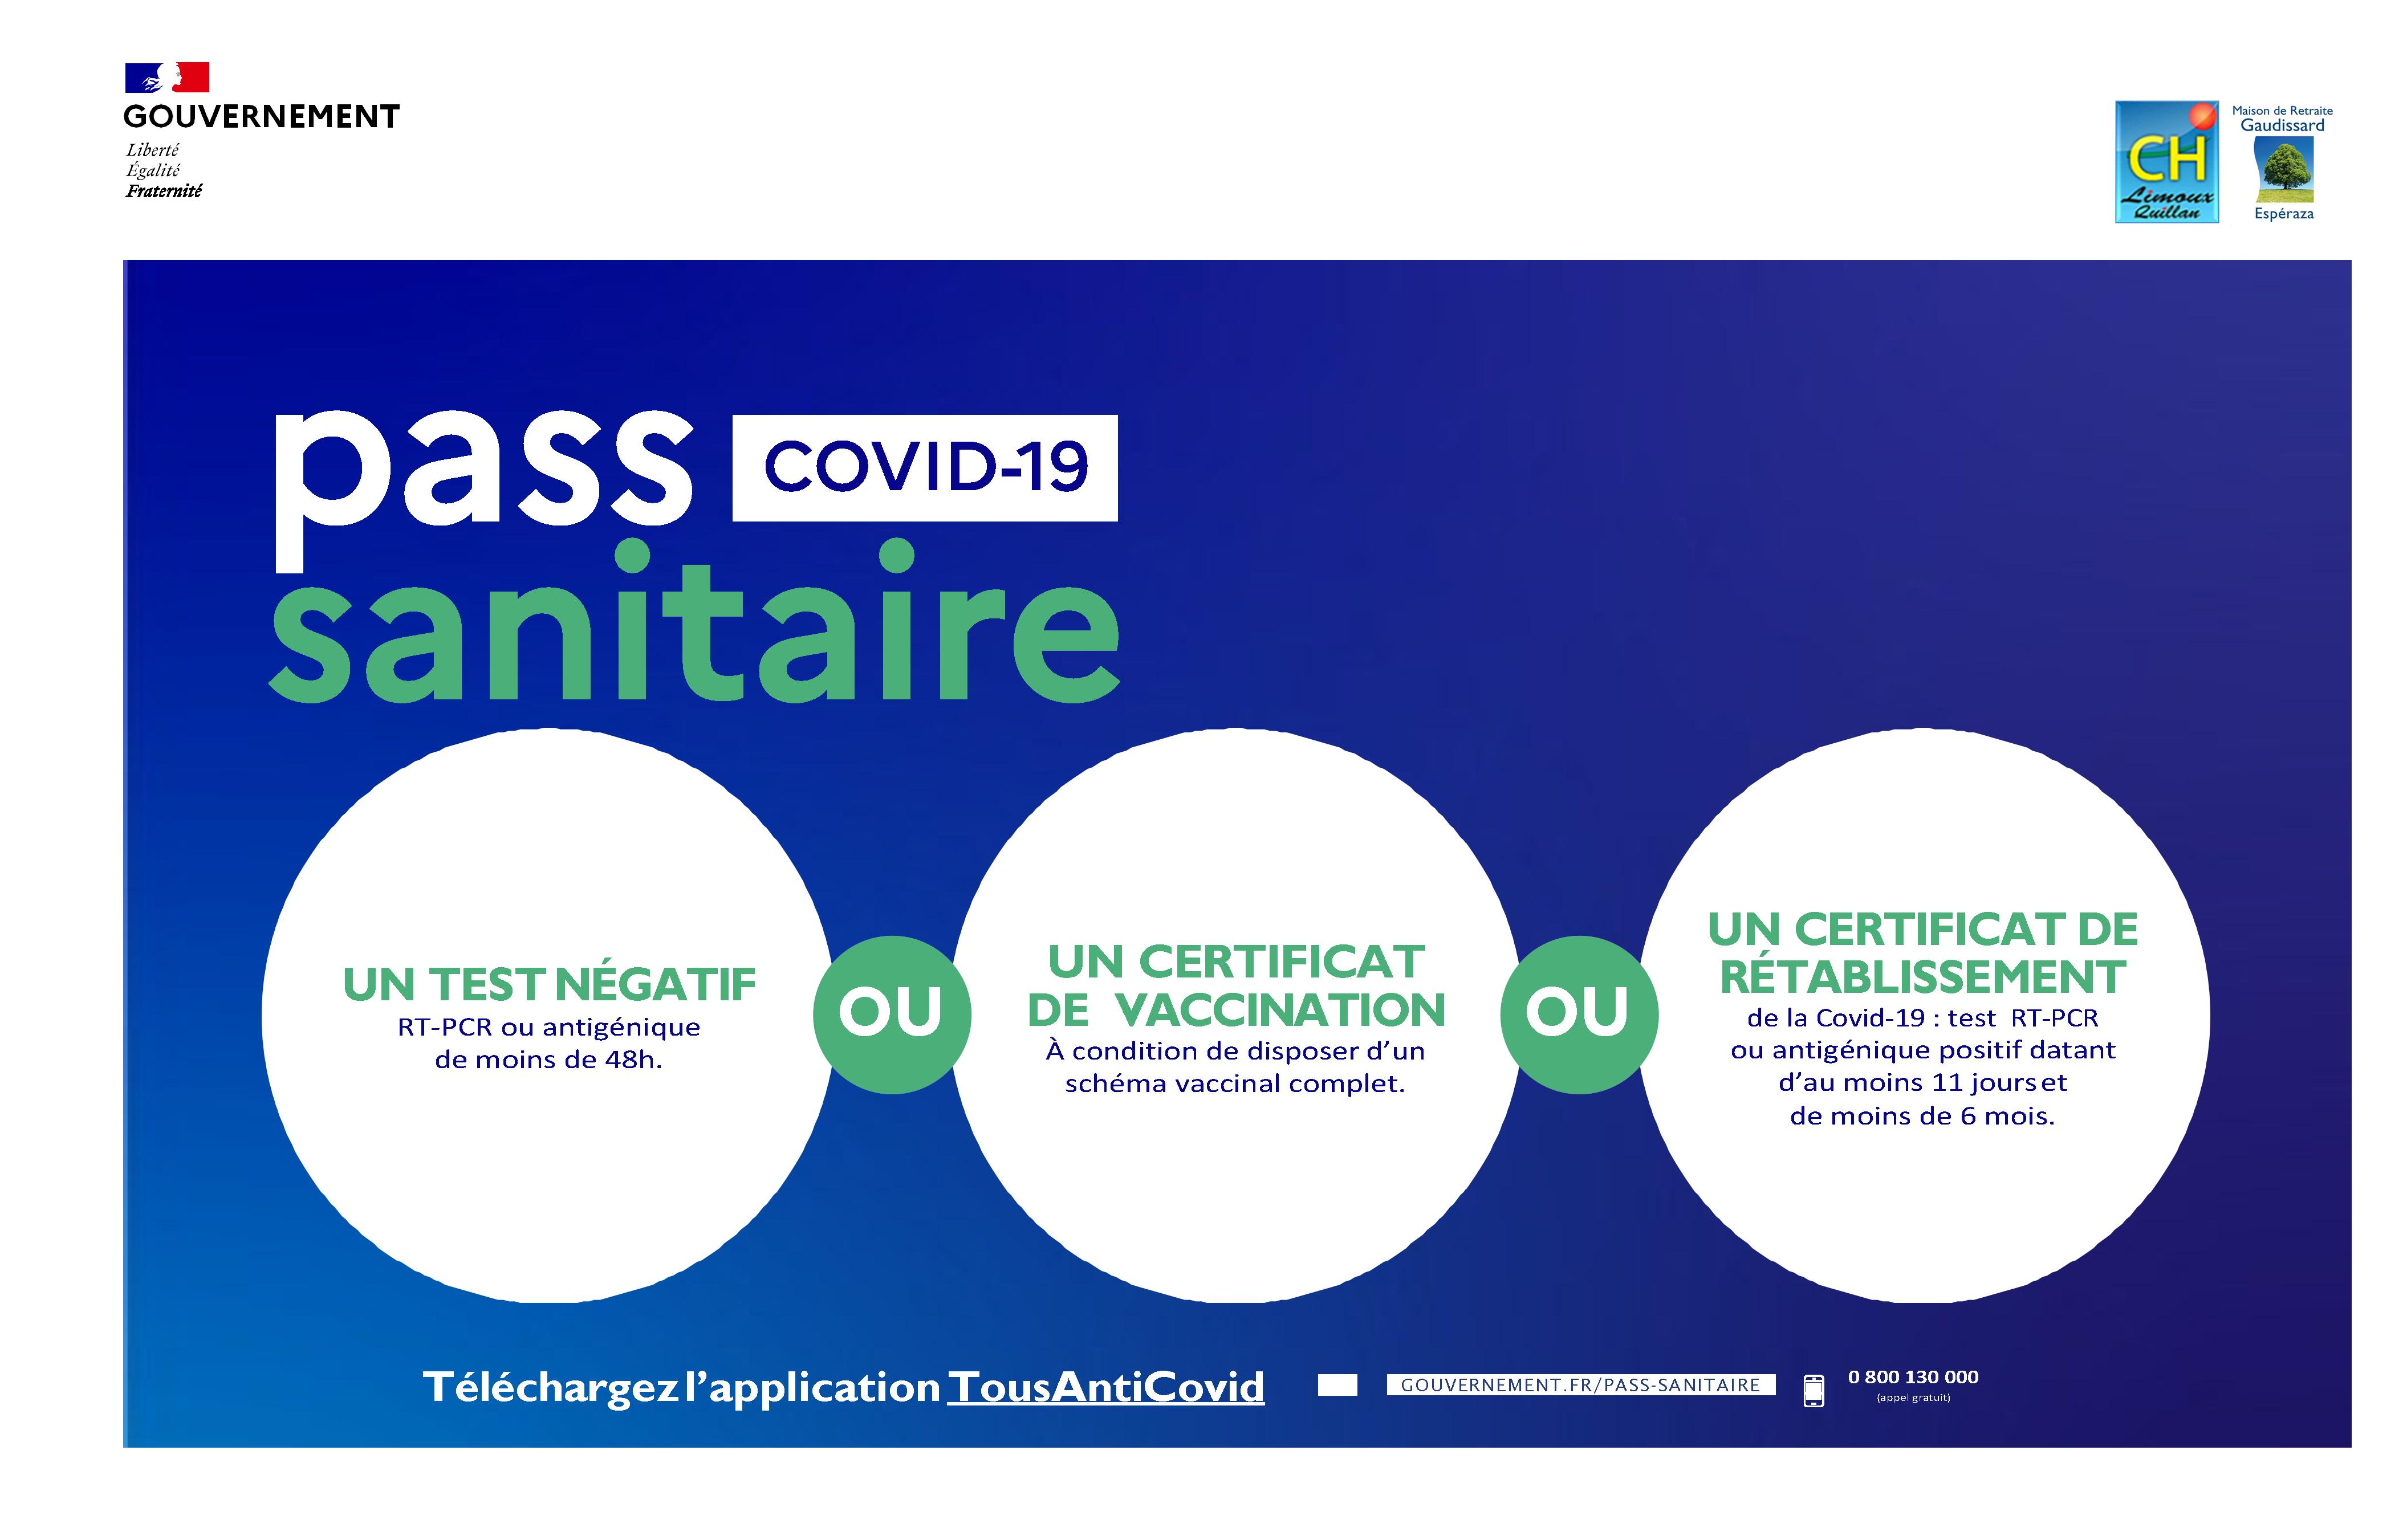 Pass_sanitaire_covid19